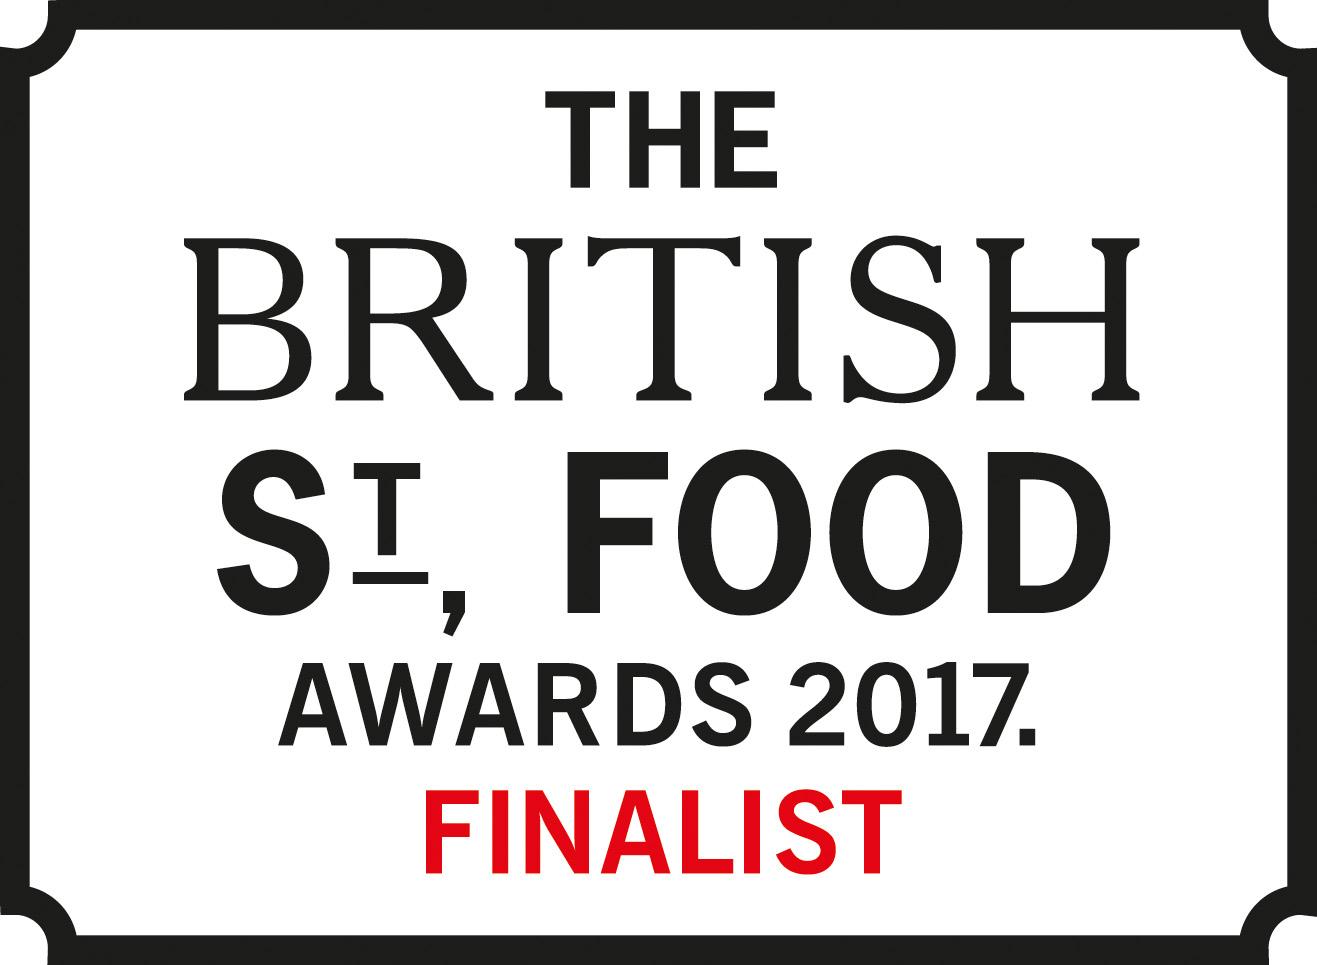 British Street Food Awards - Finalist.jpg